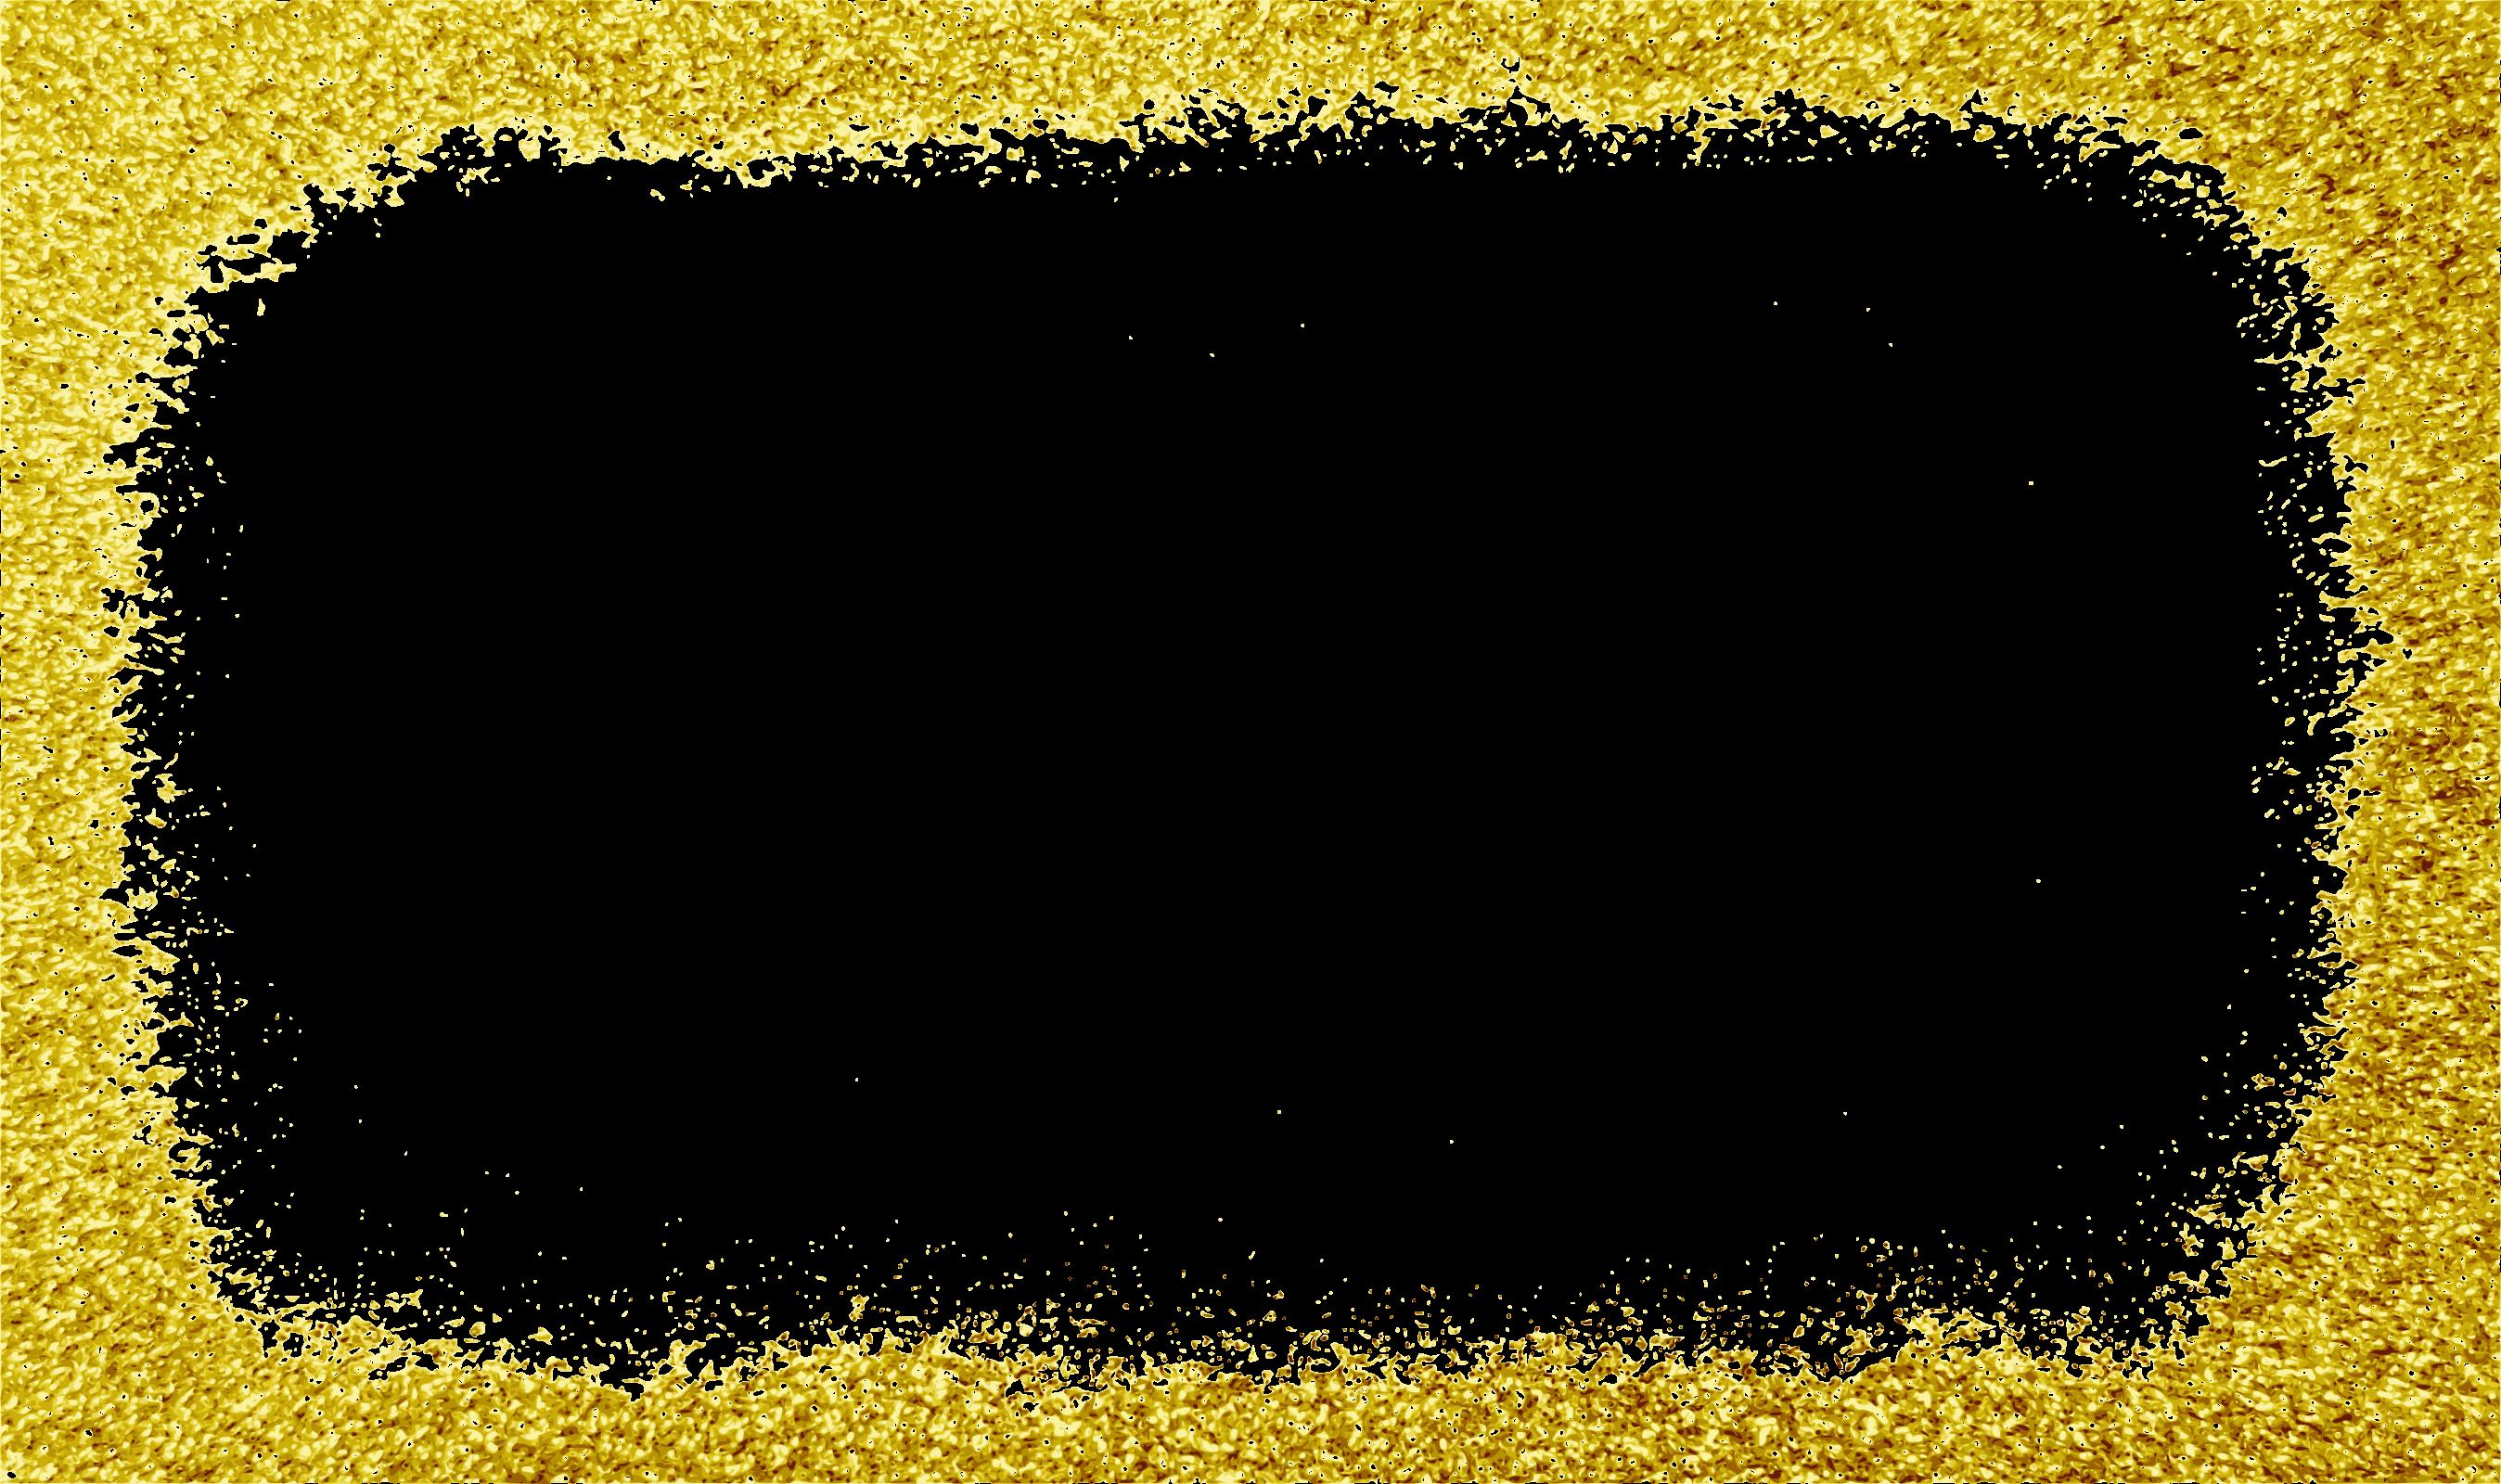 gold-glitter-frame-3.png